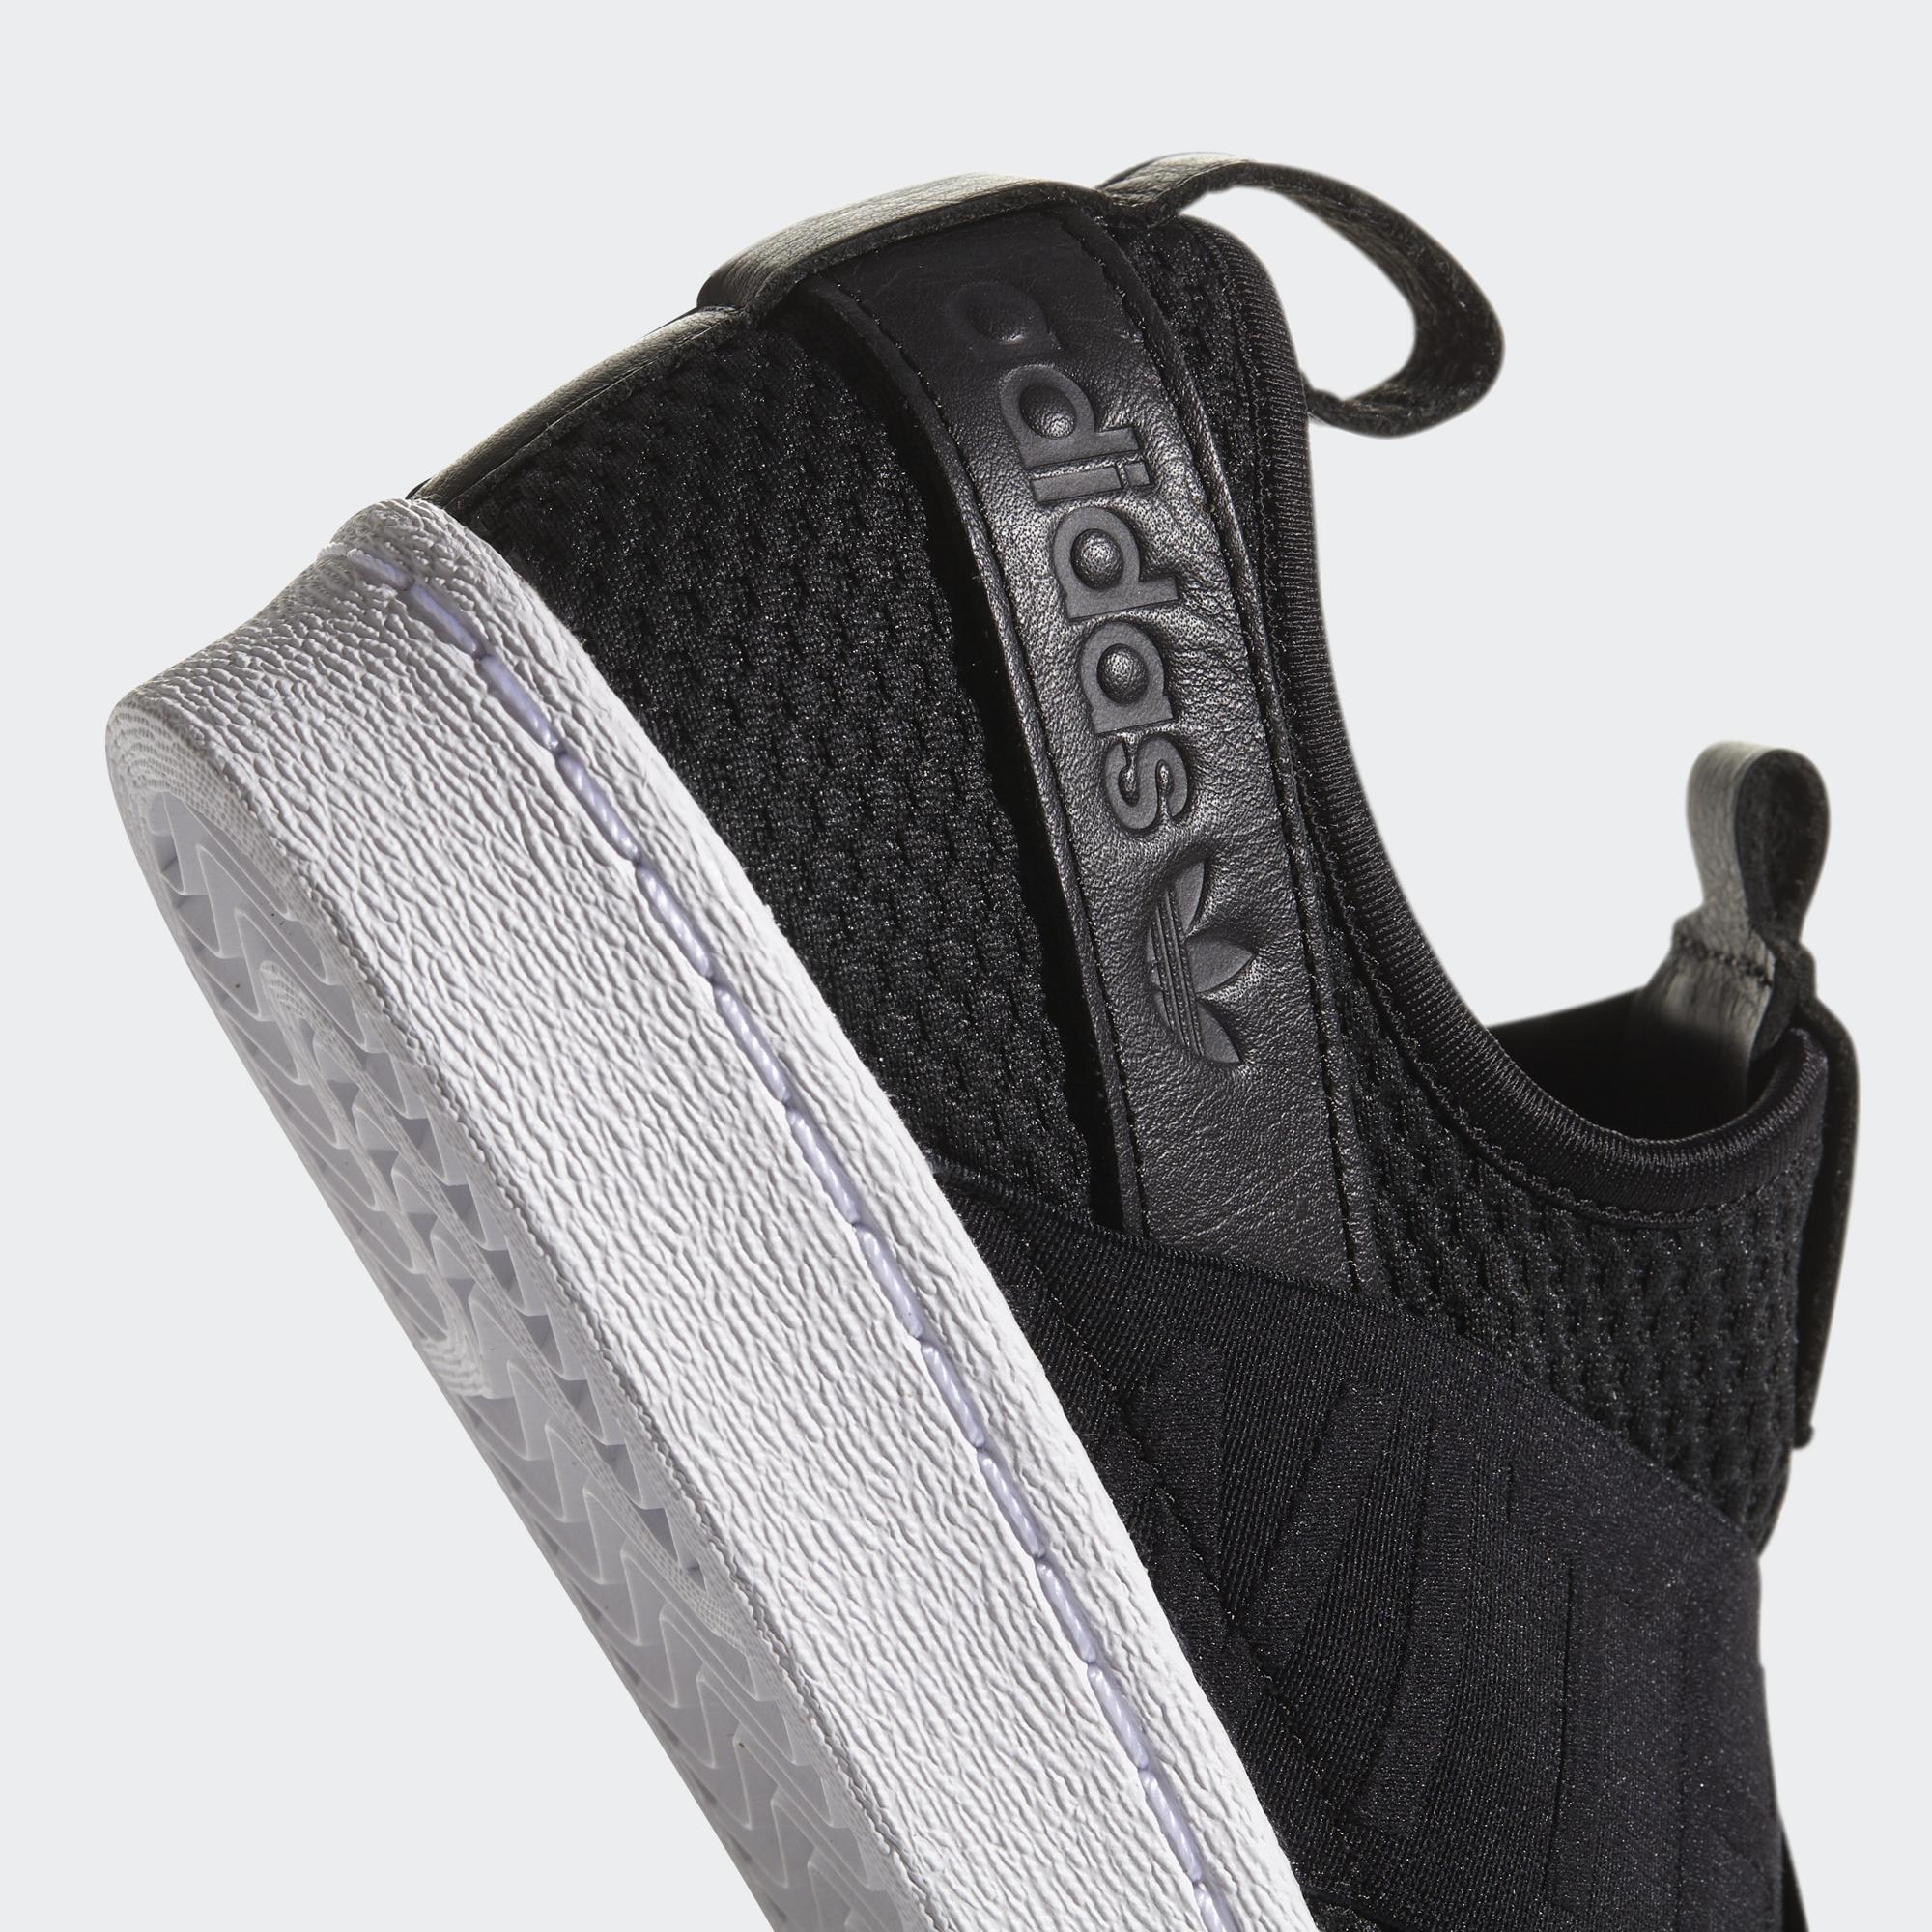 40c53b3832ed6 Dámske tenisky Adidas Superstar Slipon CQ2382, streetová obuv